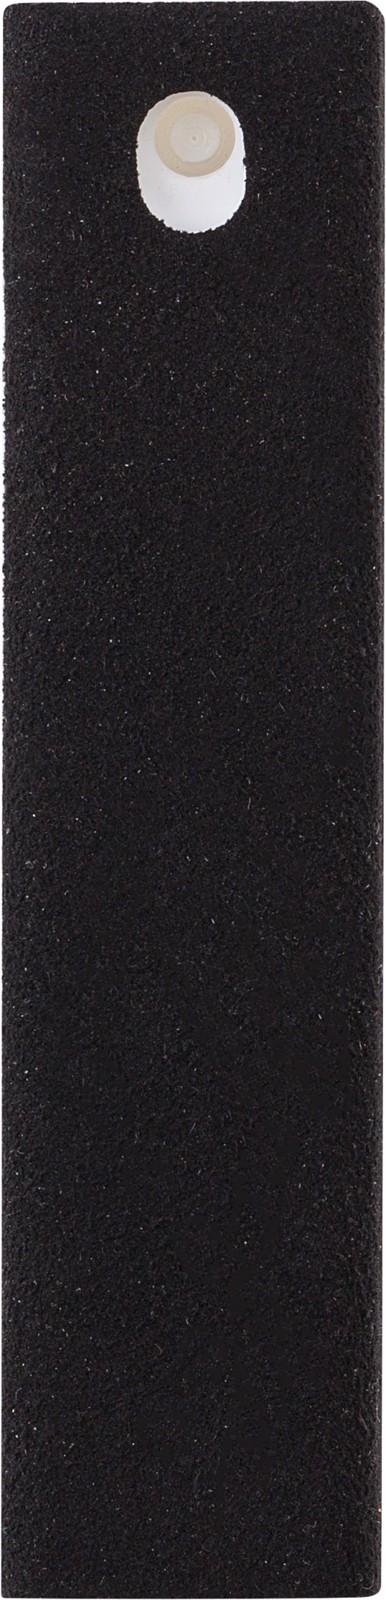 PP screen cleaner spray - Black